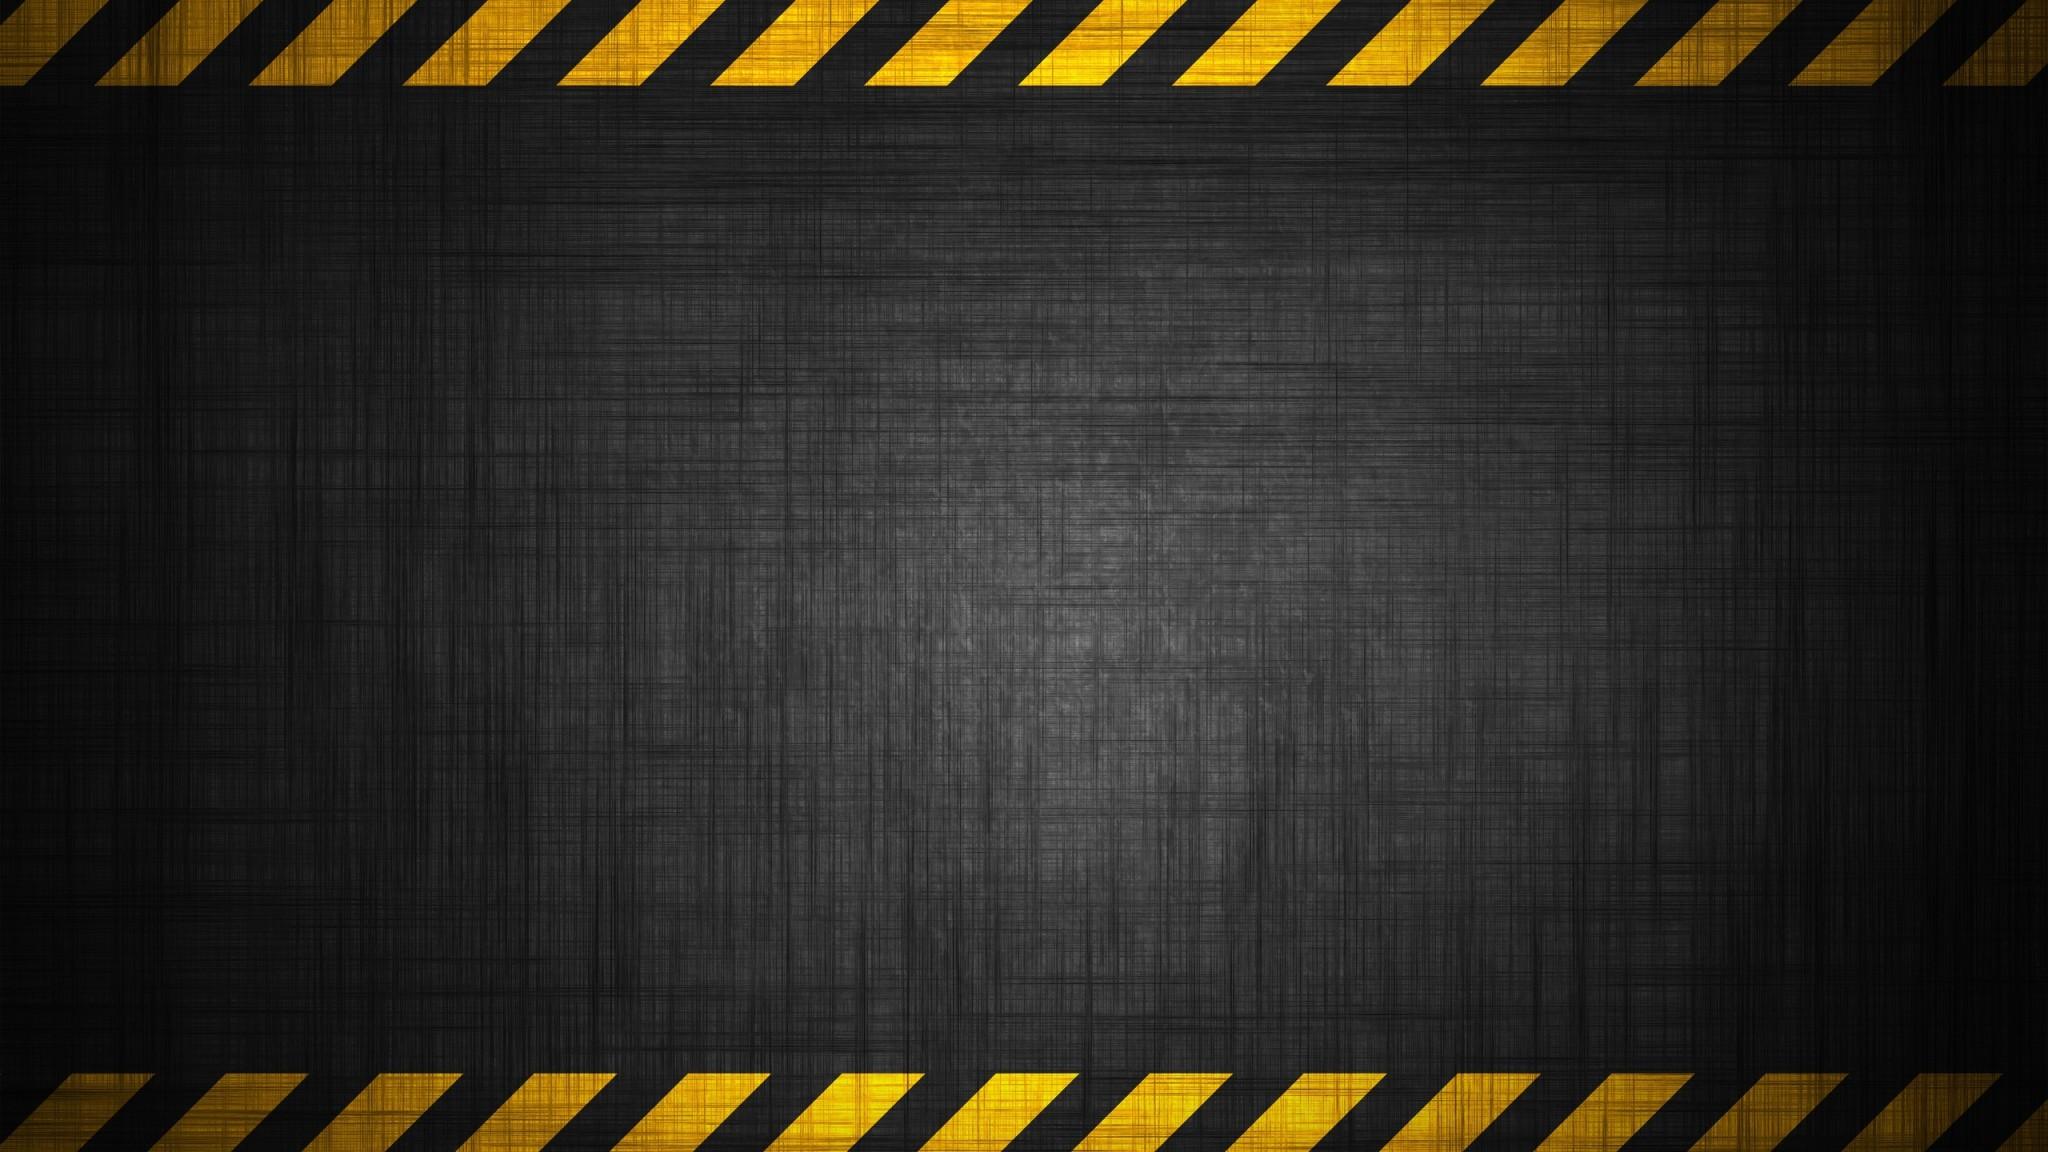 Download Wallpaper Background, Tapes, Radiation, Hazard .